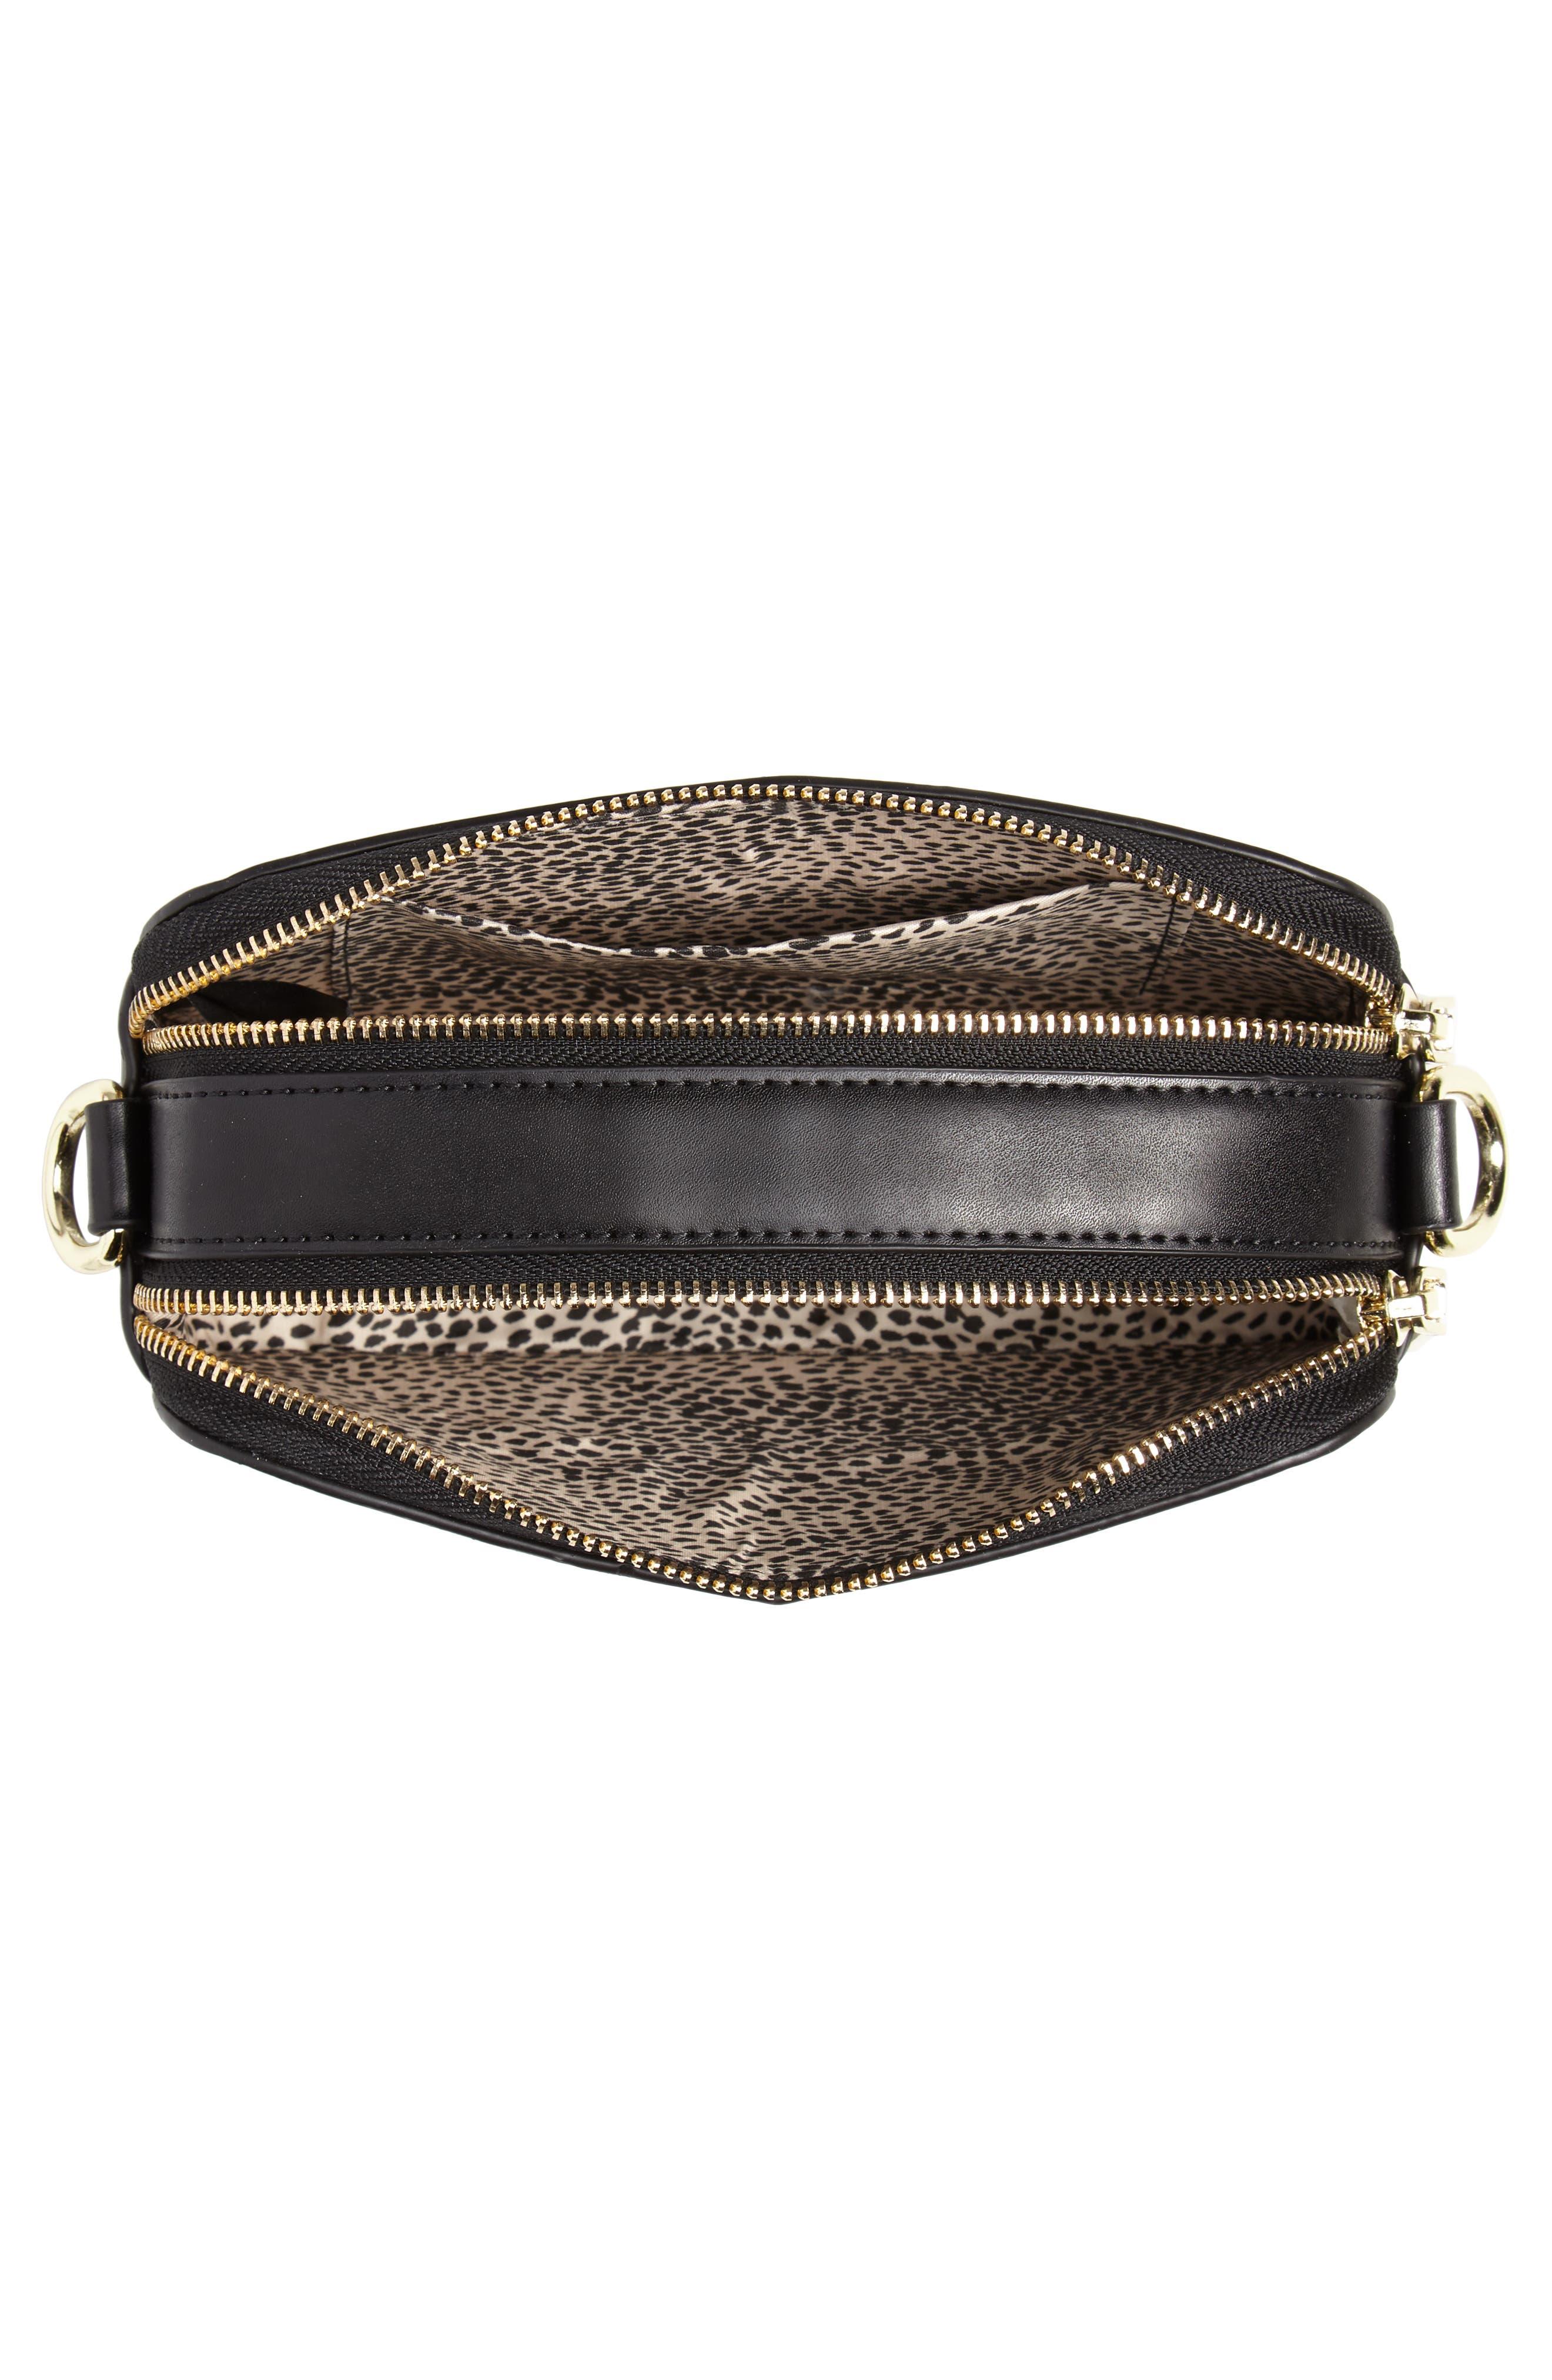 Dyana Grommet Faux Leather Crossbody Bag,                             Alternate thumbnail 5, color,                             Black